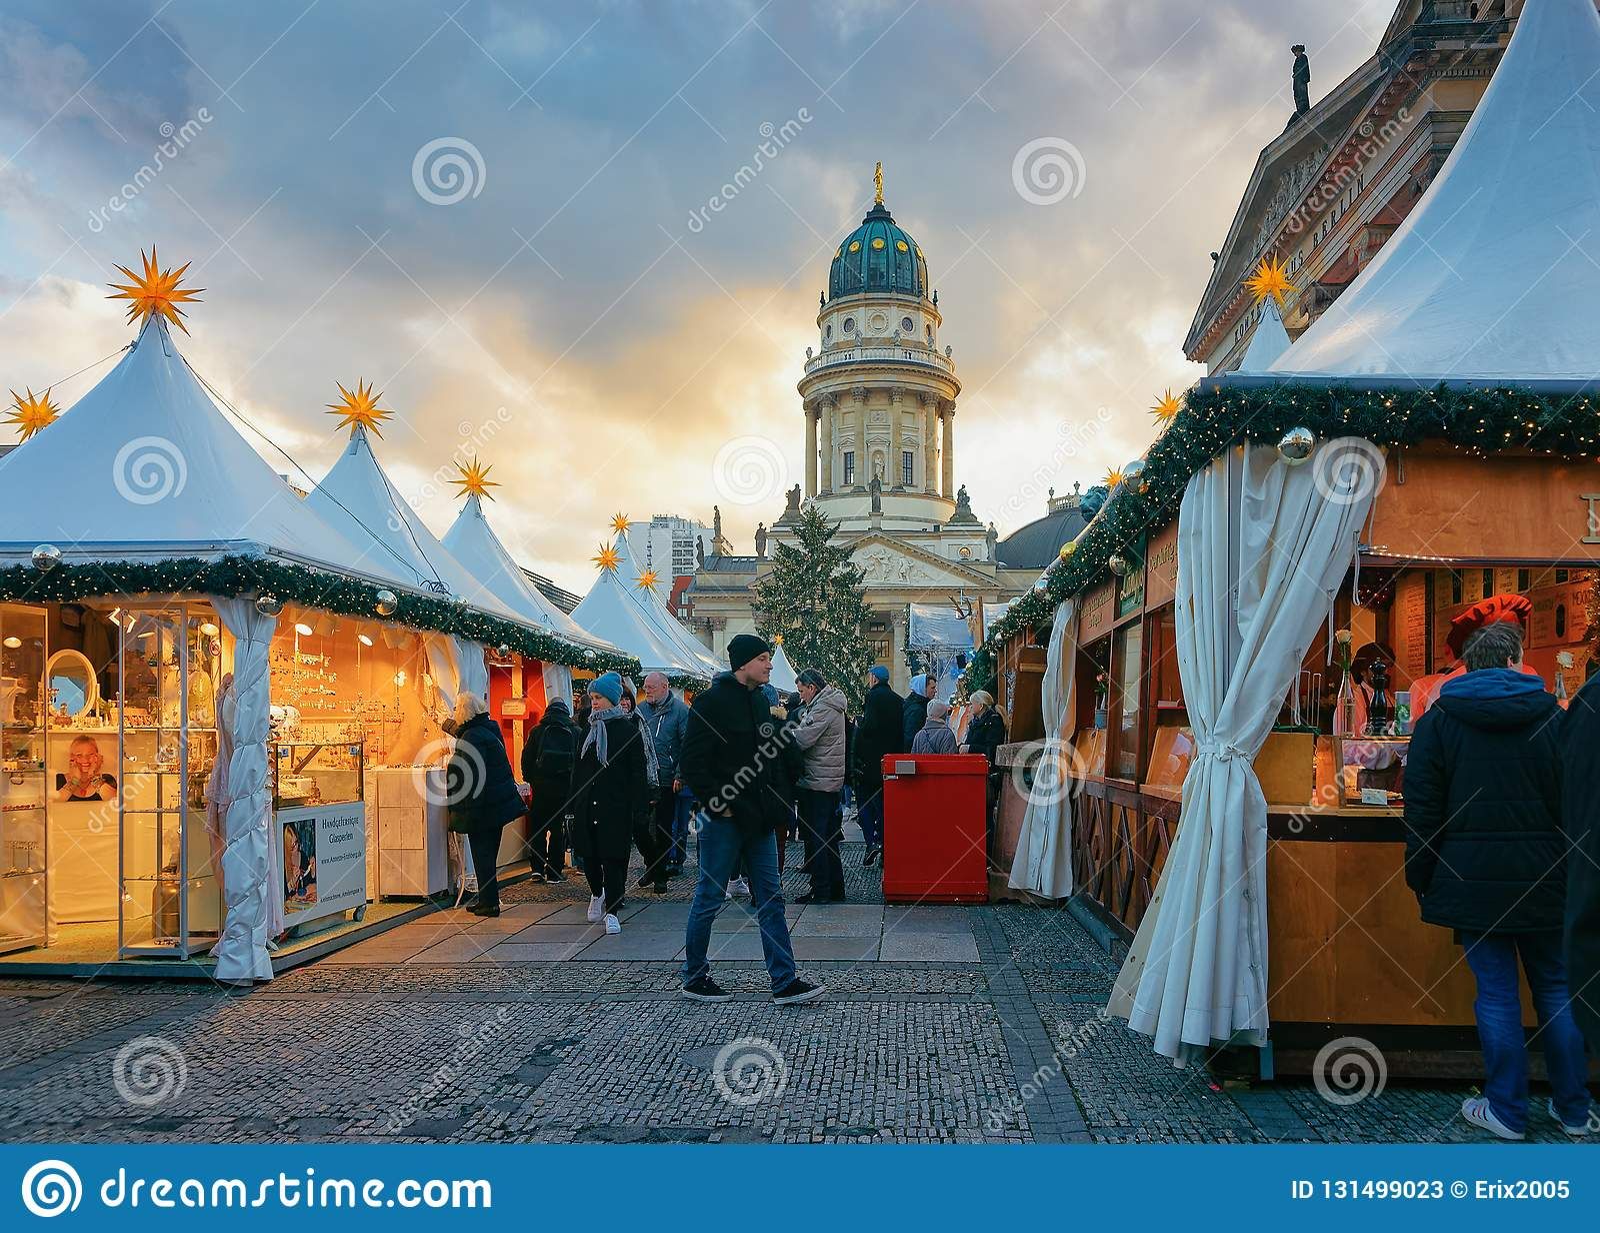 berlin germany december 8 2017 people on christmas. Black Bedroom Furniture Sets. Home Design Ideas